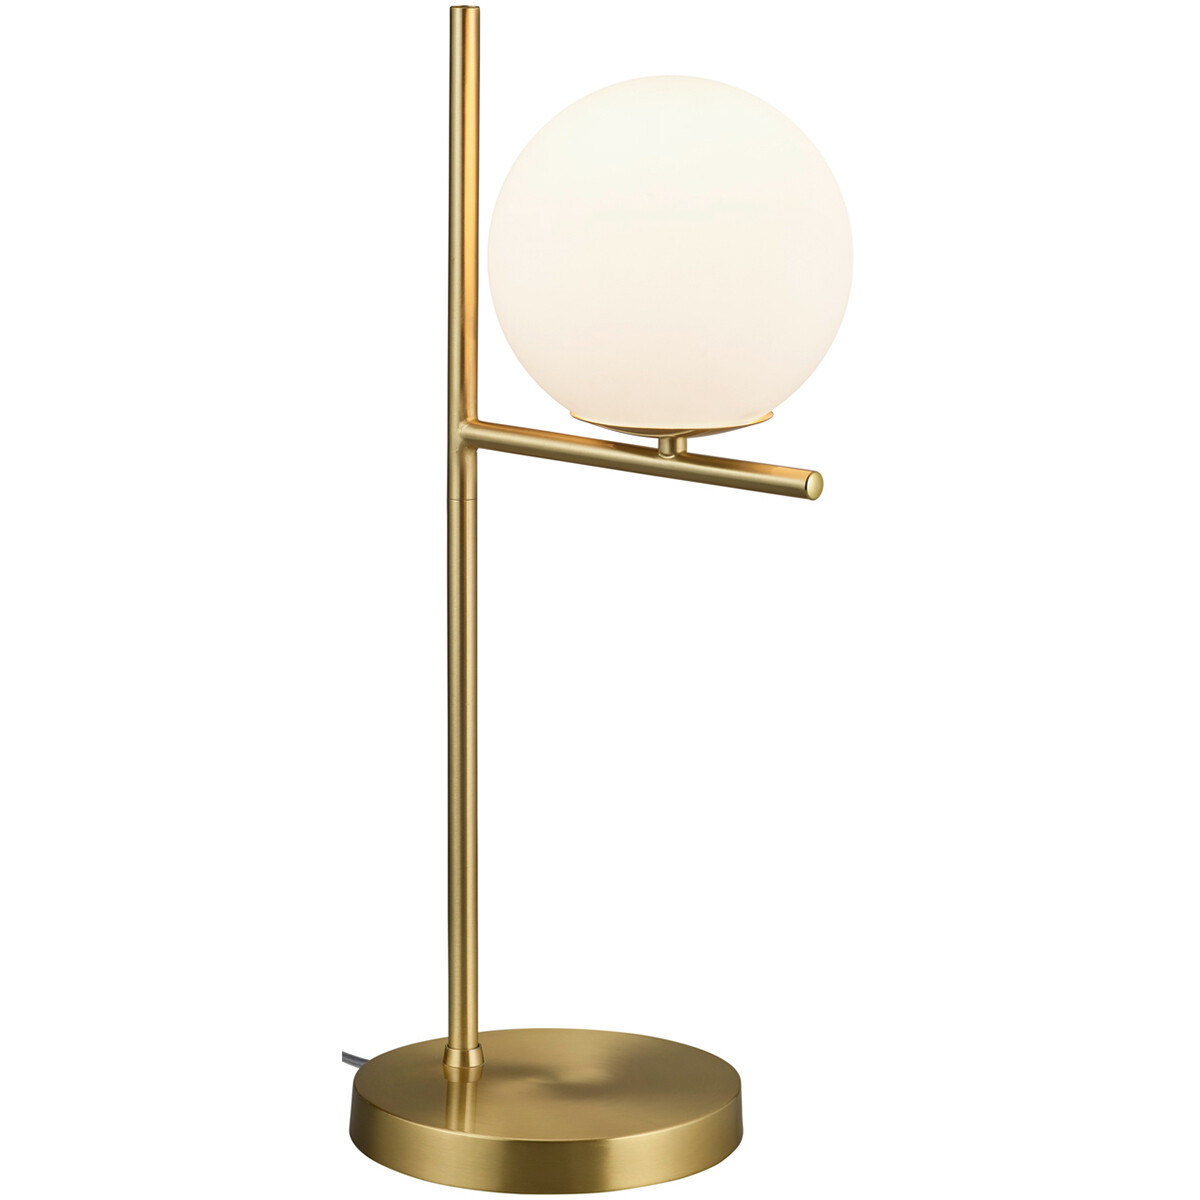 LED Tafellamp - Trion Pora - E14 Fitting - Rond - Mat Goud - Aluminium